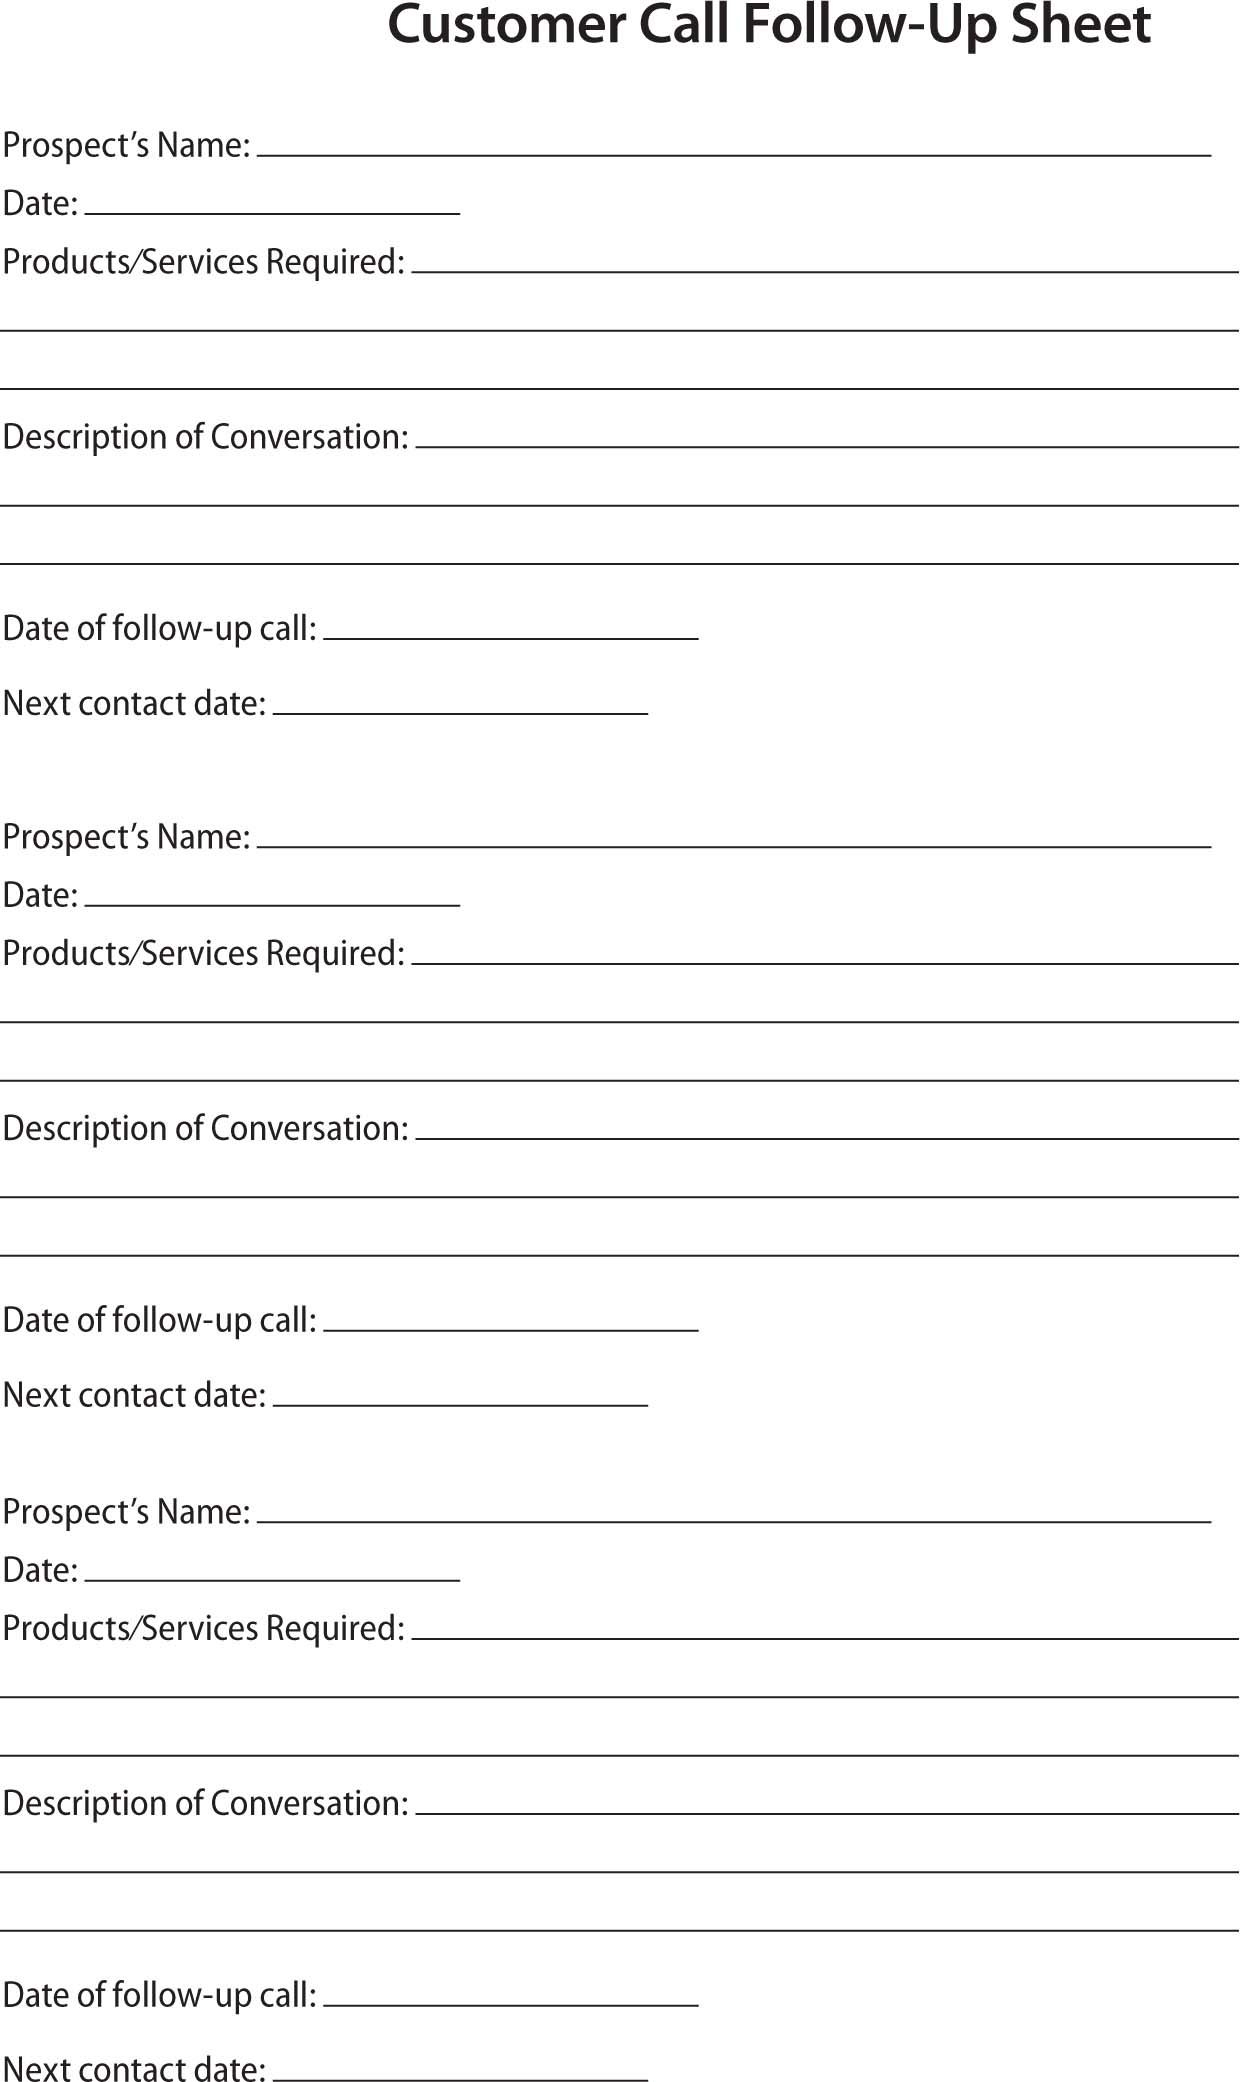 80 20 Prospect Sheet Customer Call Follow Up | Call Sheet - Free Printable Salon Sign In Sheets